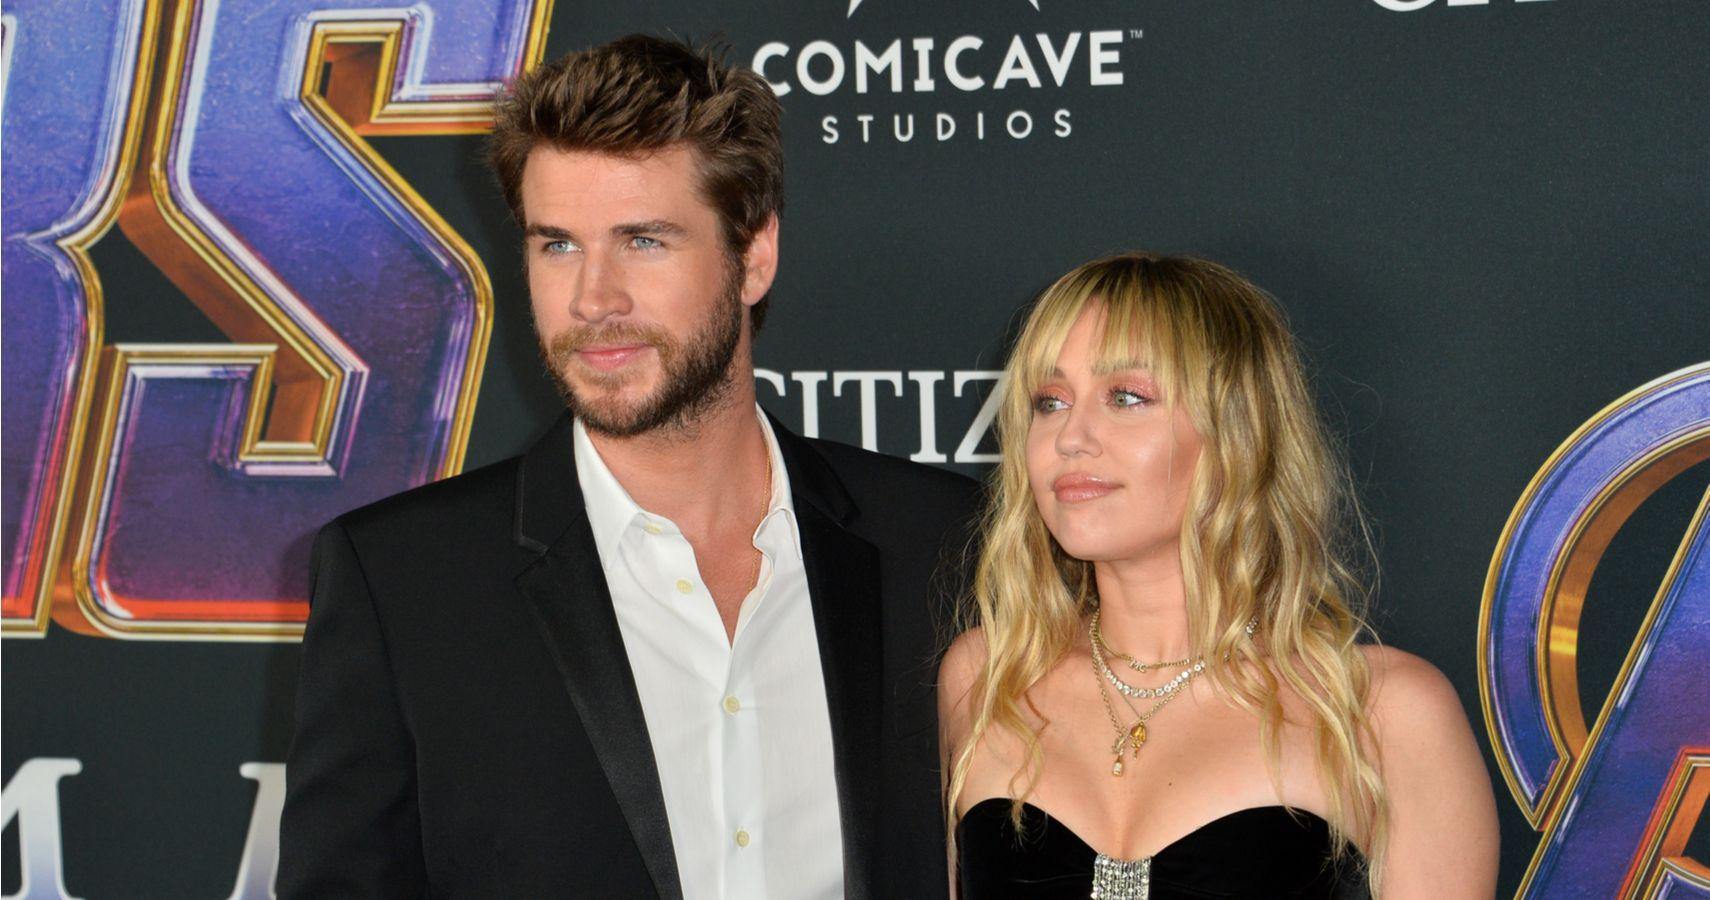 Miley Cyrus Fans Slam Liam Hemsworth As Avengers Premiere Video Resurfaces